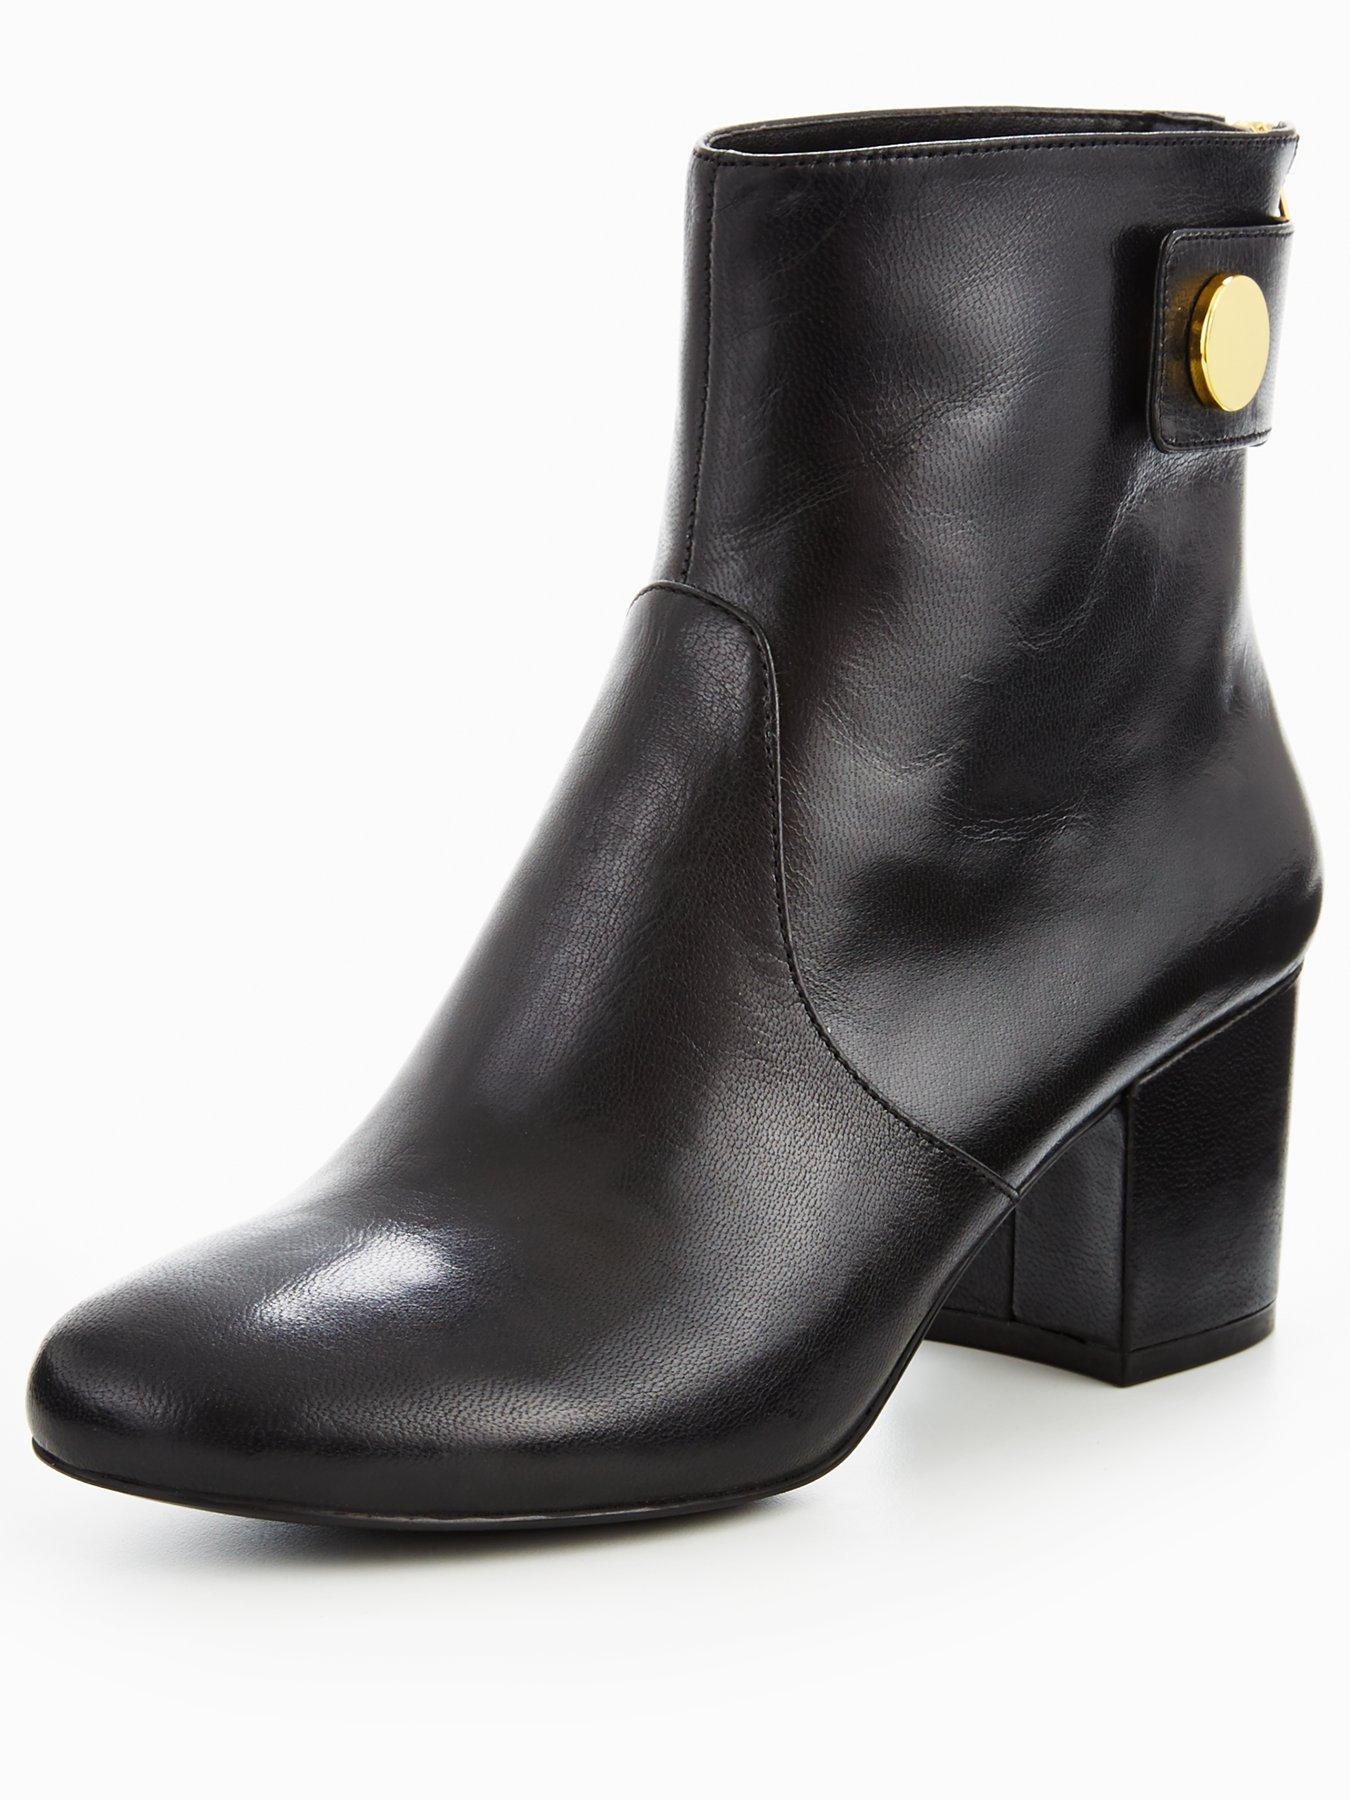 Nine West Quarryn Mid Heel Boot With Stud Detail 1600179961 Women's Shoes Nine West Boots